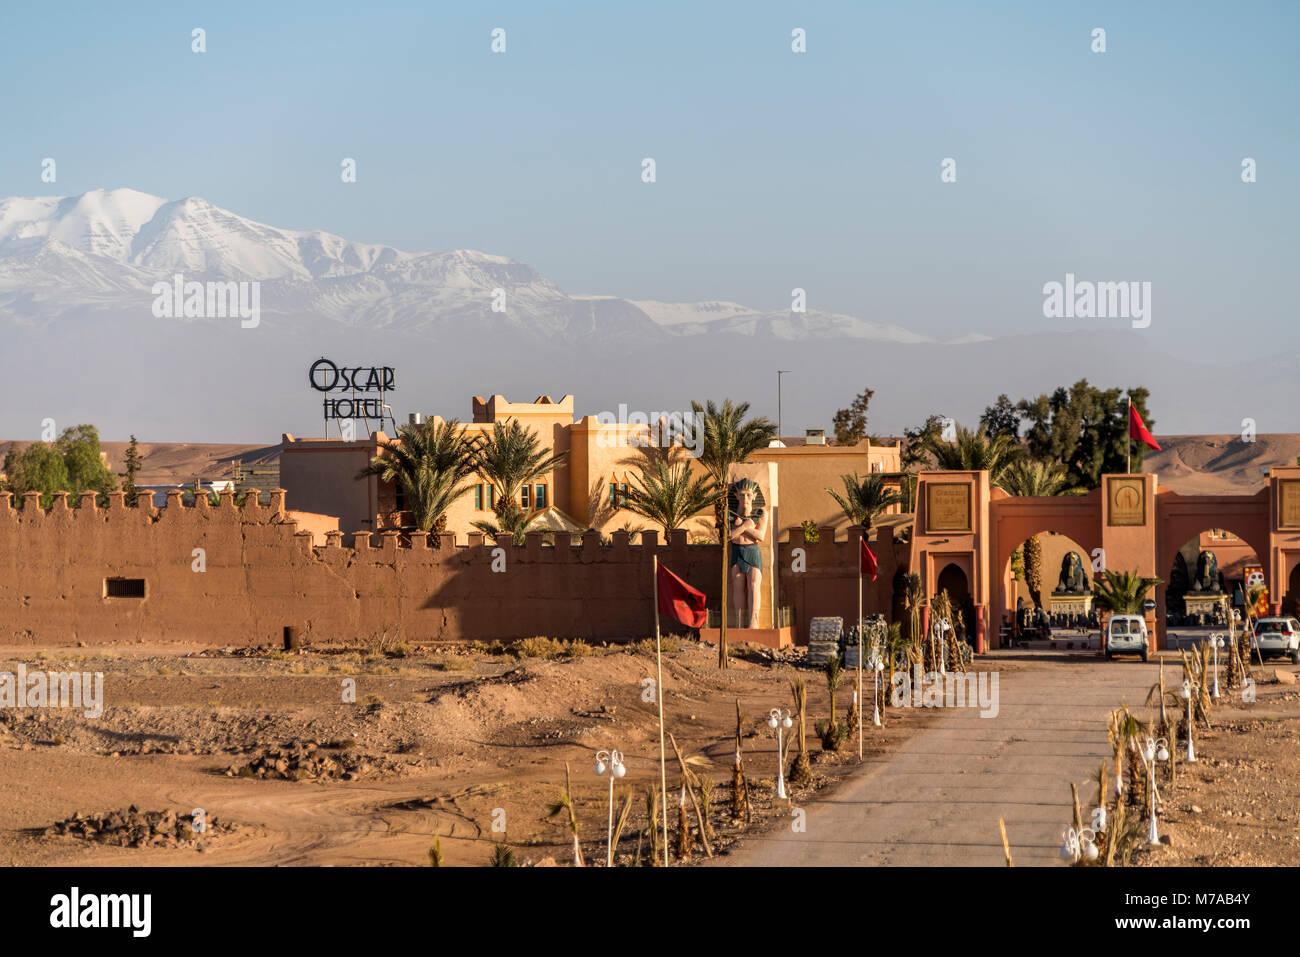 Atlas Corporation Studios y Oscar Hotel, Ouarzazate, Marruecos Imagen De Stock